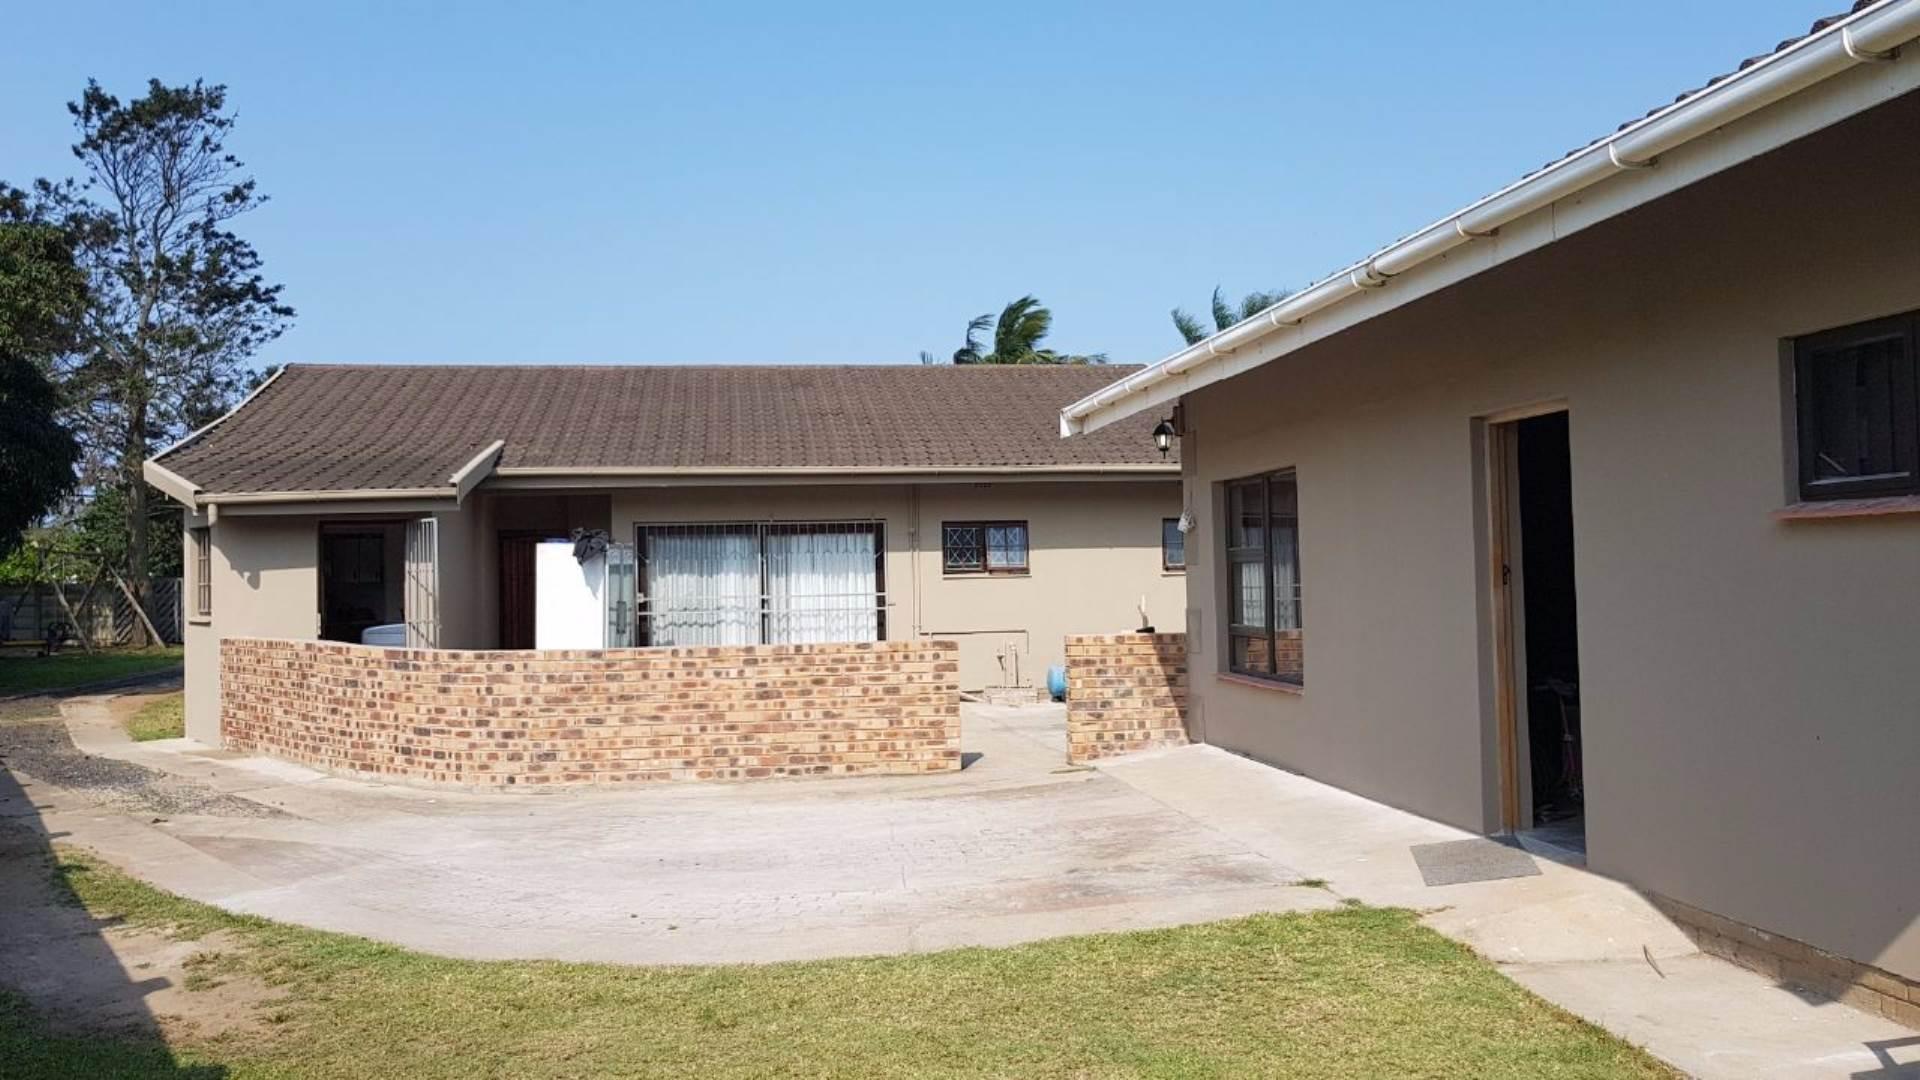 3 BedroomHouse For Sale In Meer En See